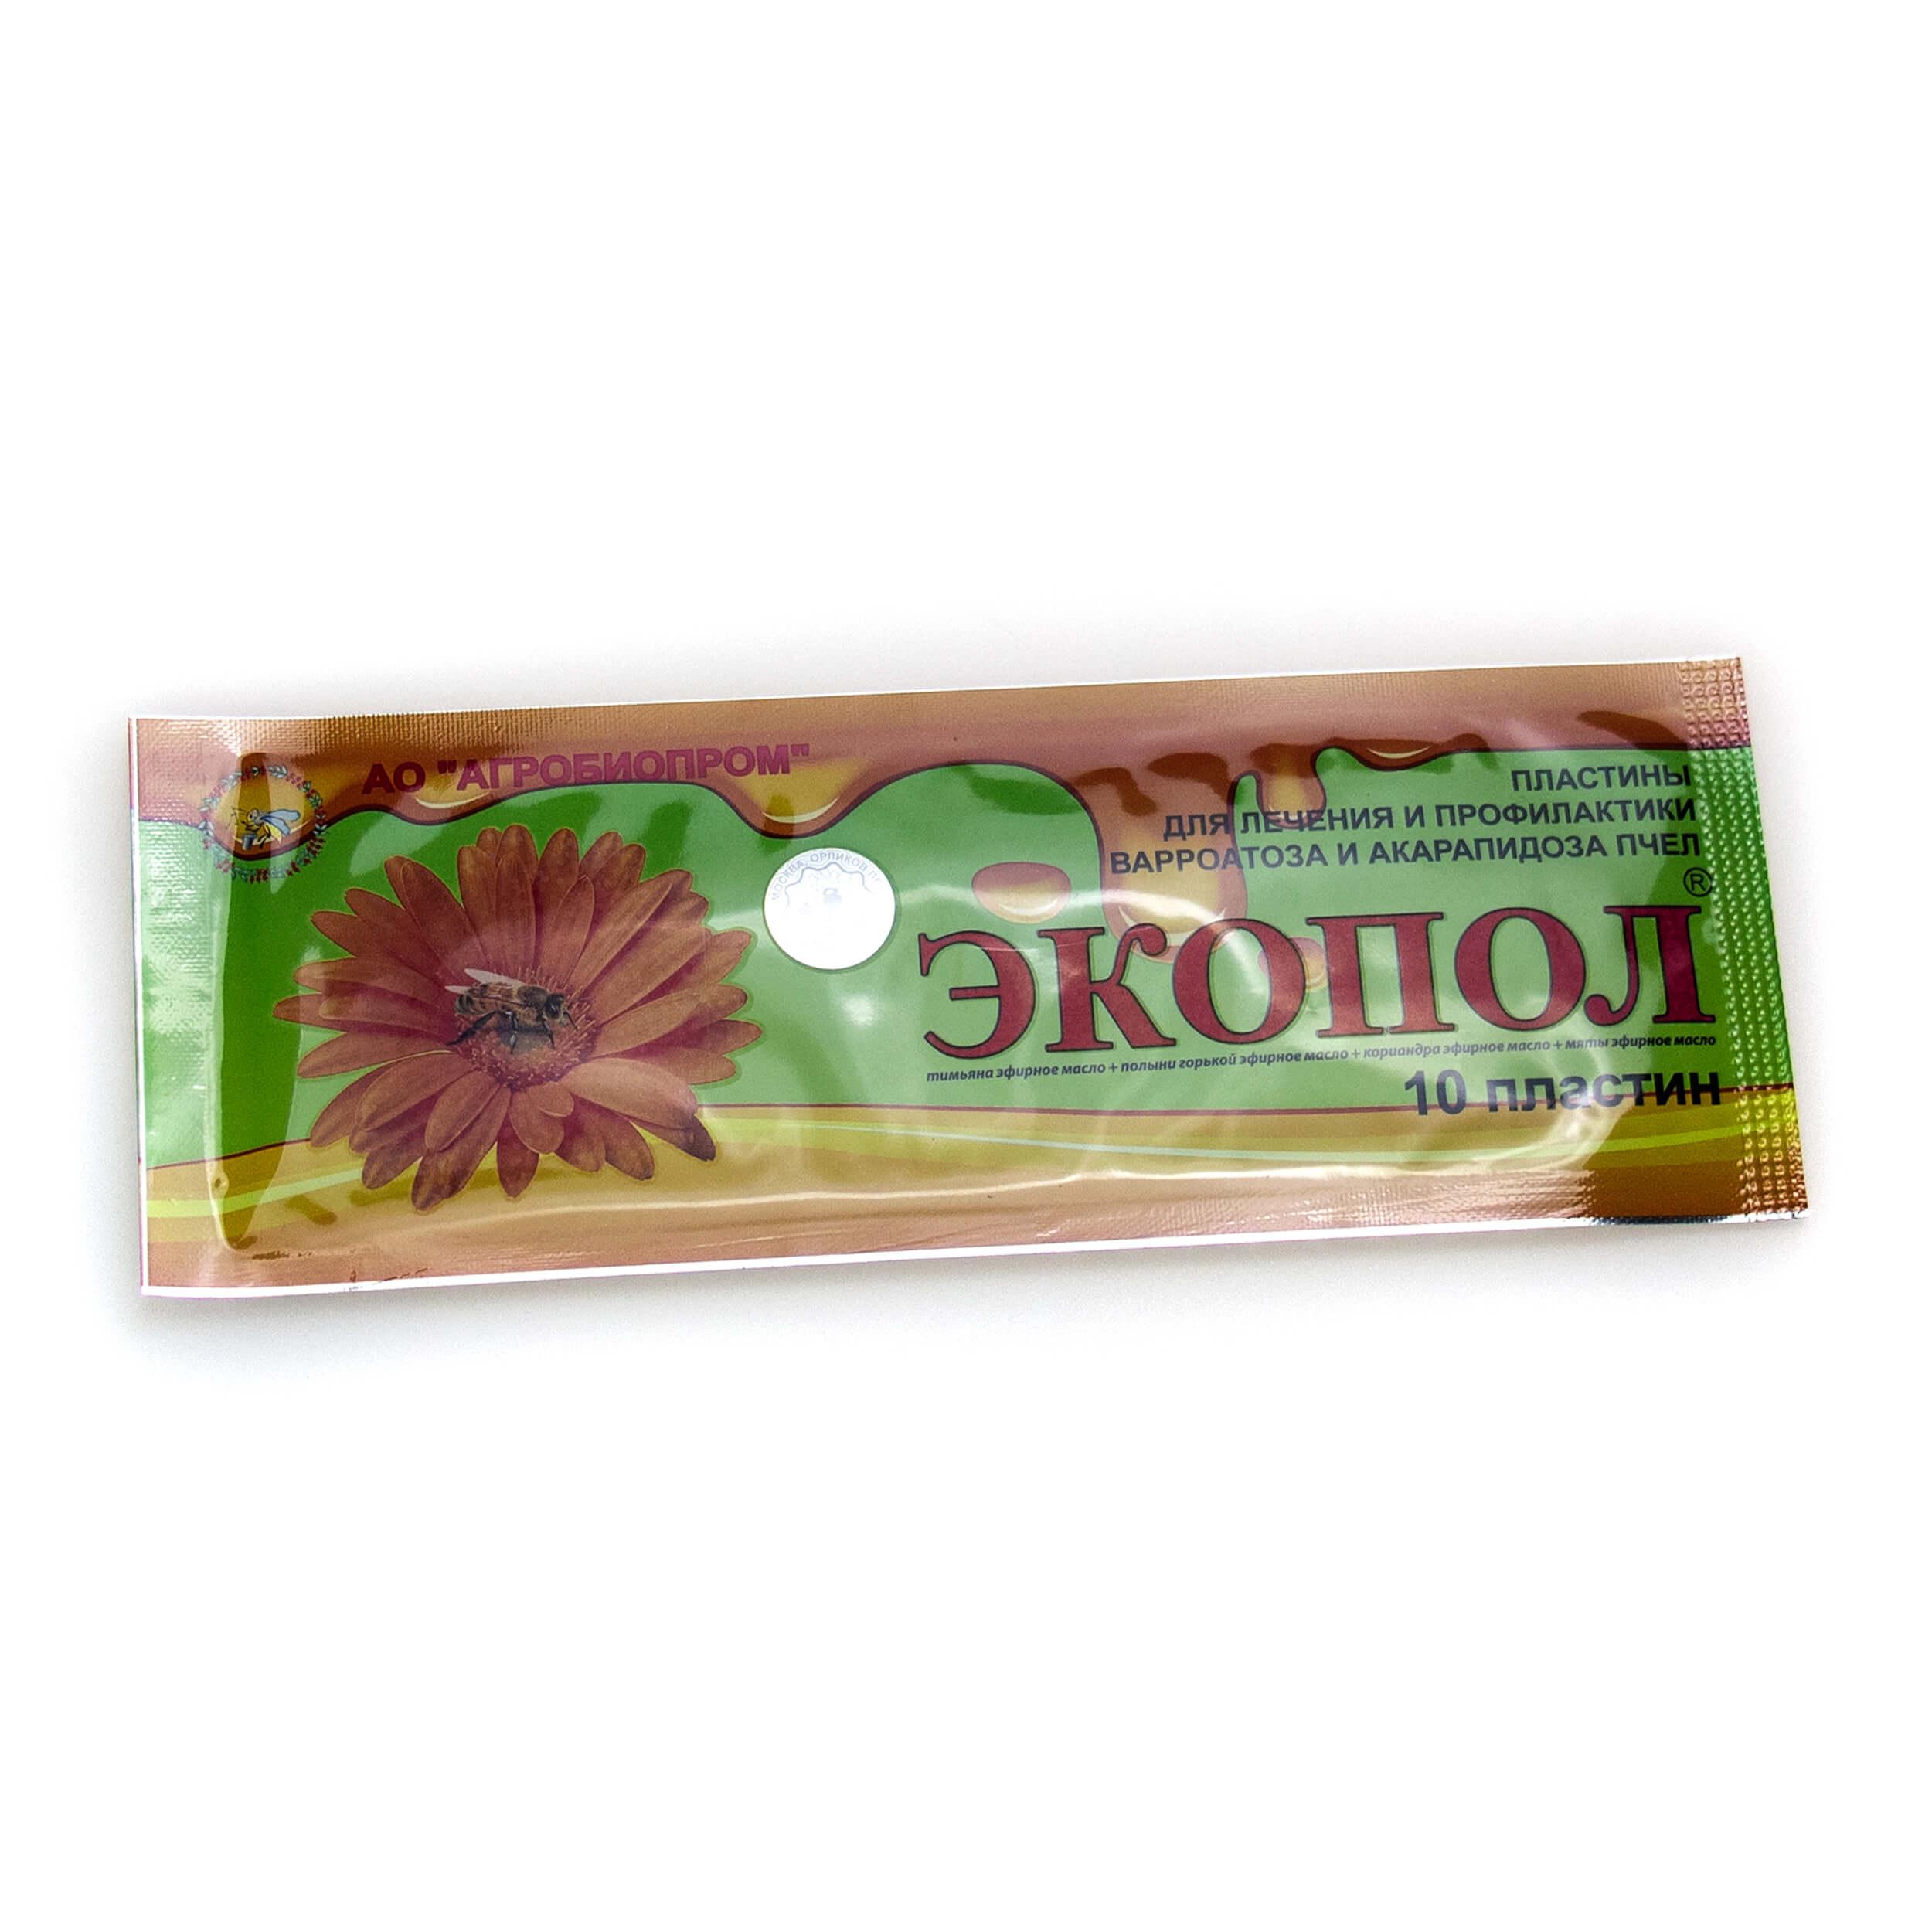 ЭкоПол (Полоски, 10 штук) фото